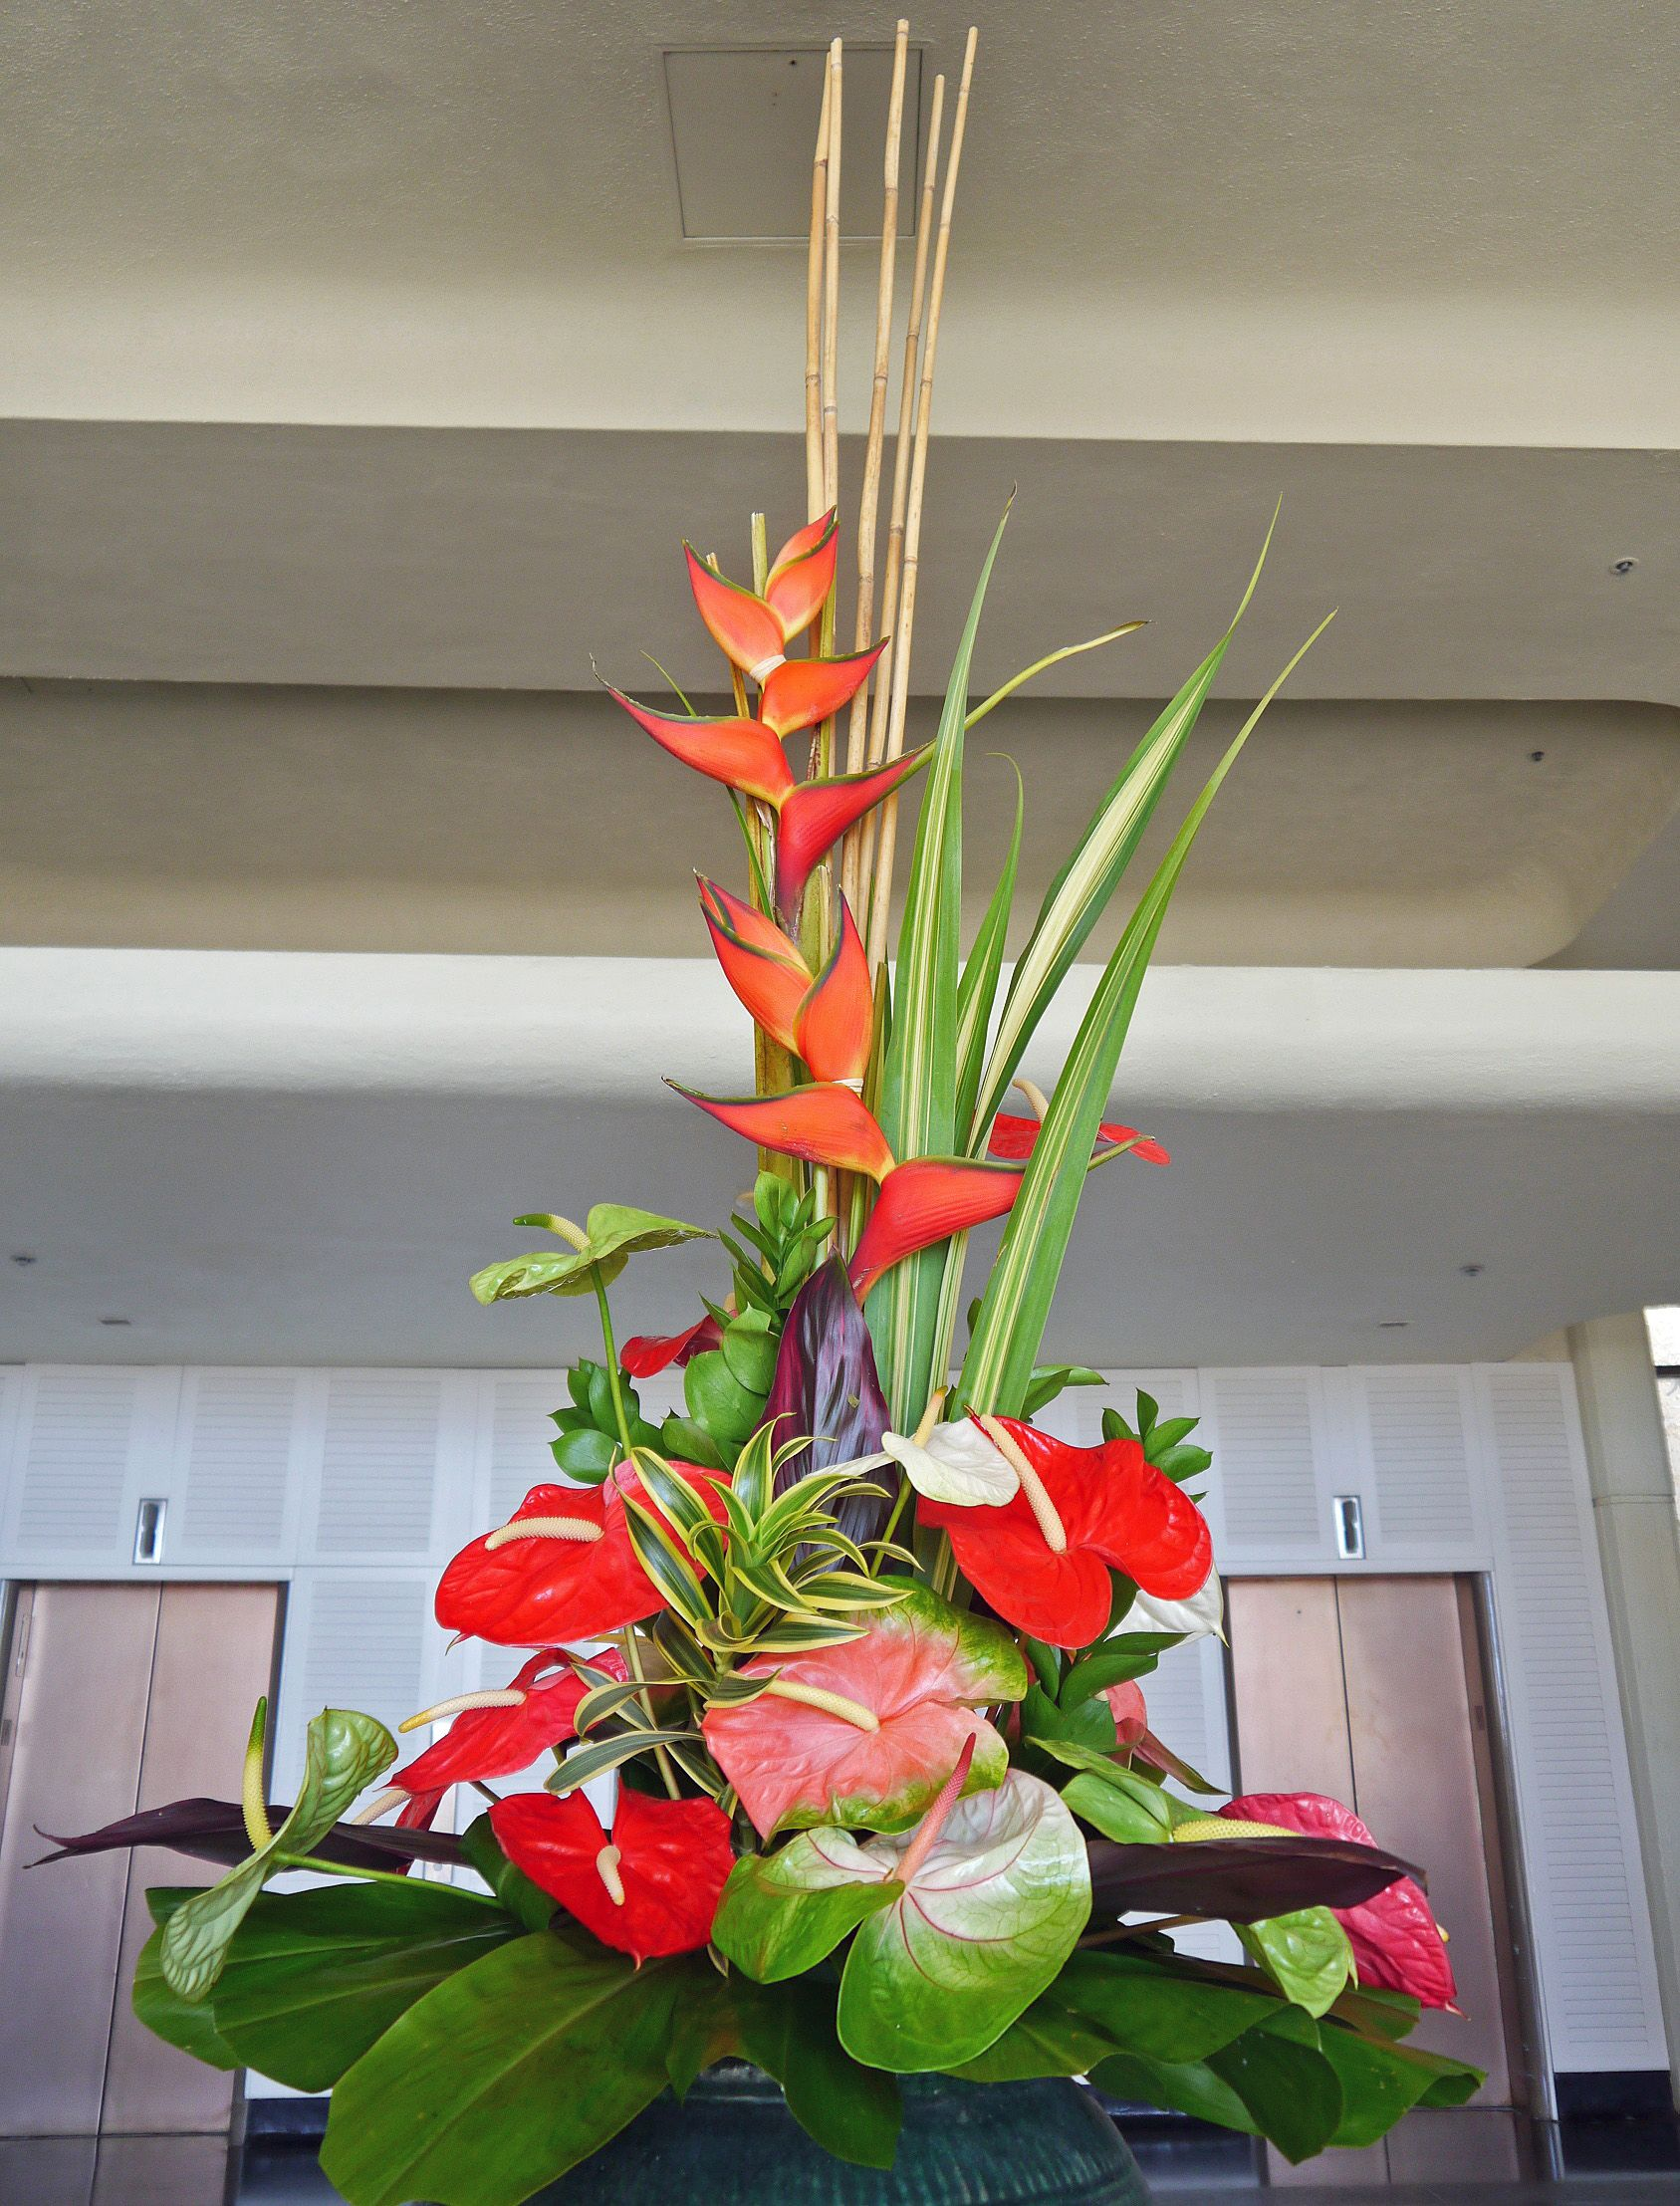 Tropical Flower Arrangementhawaii Plants And Flowers Of Hawaii